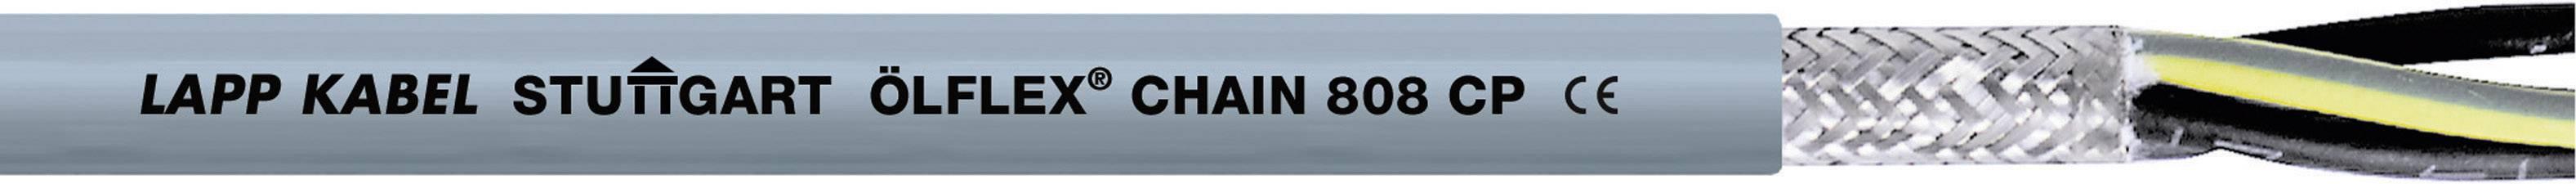 Žíla kabelu LappKabel ÖLFLEX CHAIN 808 CP 3G1,0 (1027768), 3x 1 mm², polyurethan, Ø 6,9 mm, stíněný, 50 m, šed